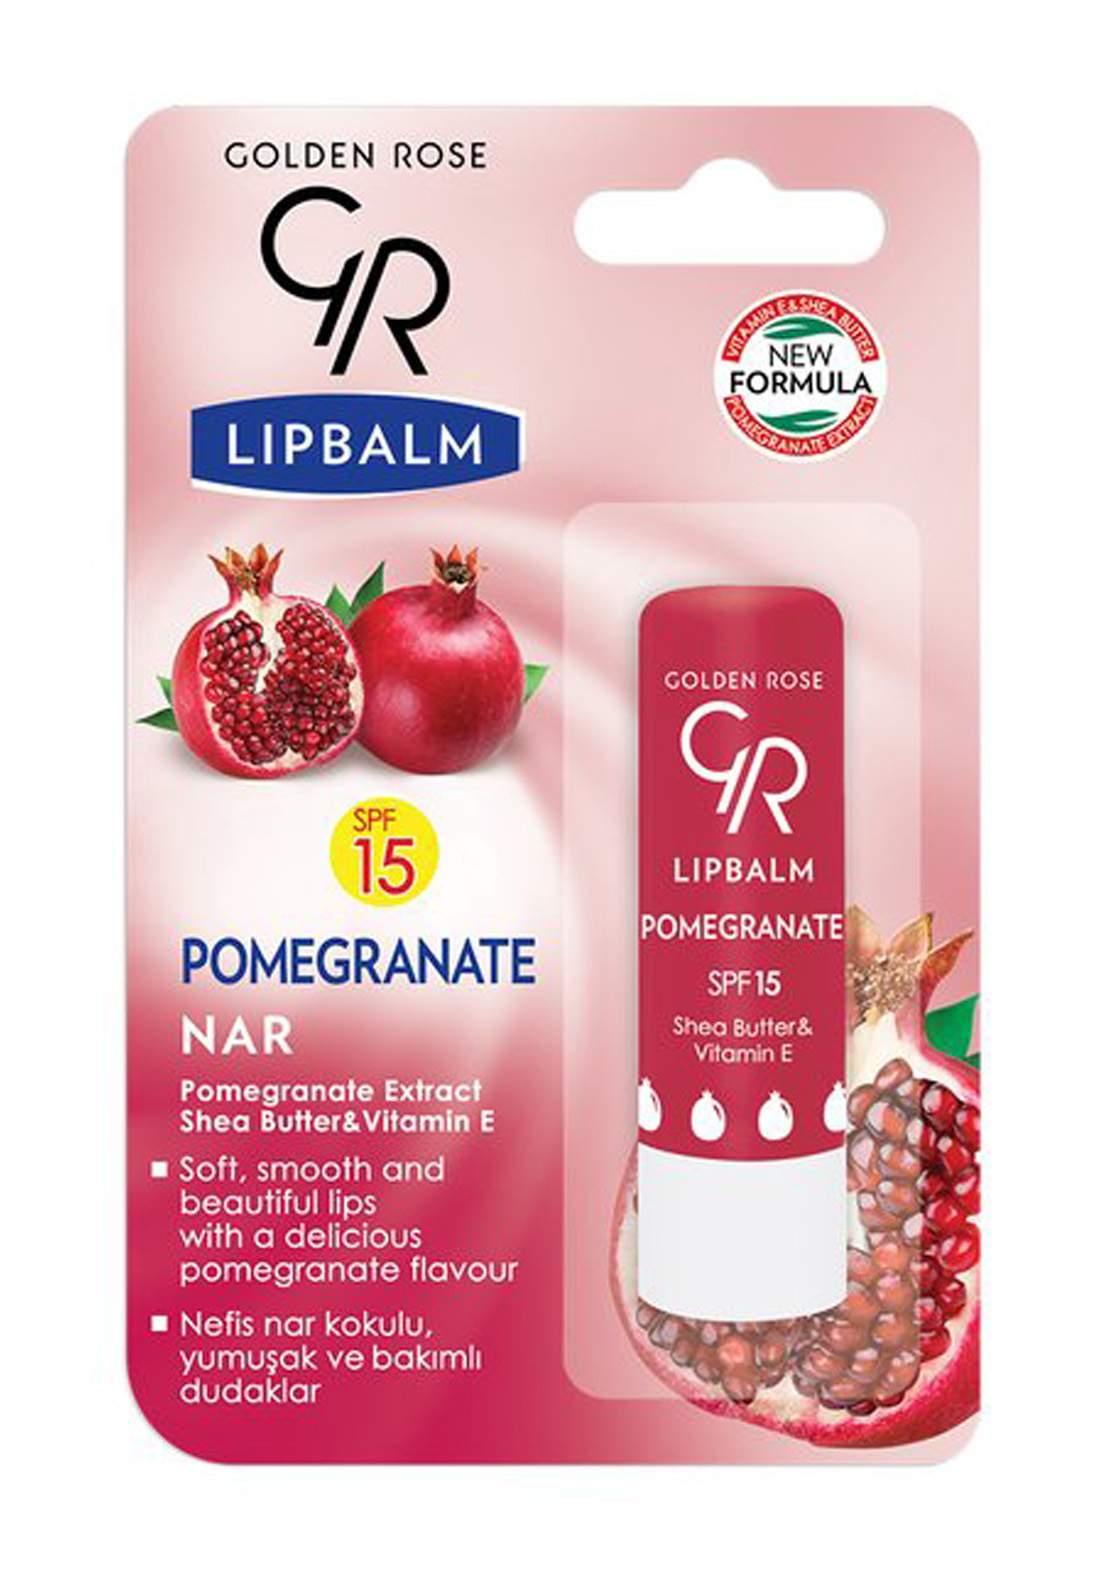 Golden Rose Lip Balm Pomegranate SPF 15 N0.08  مرطب شفاه